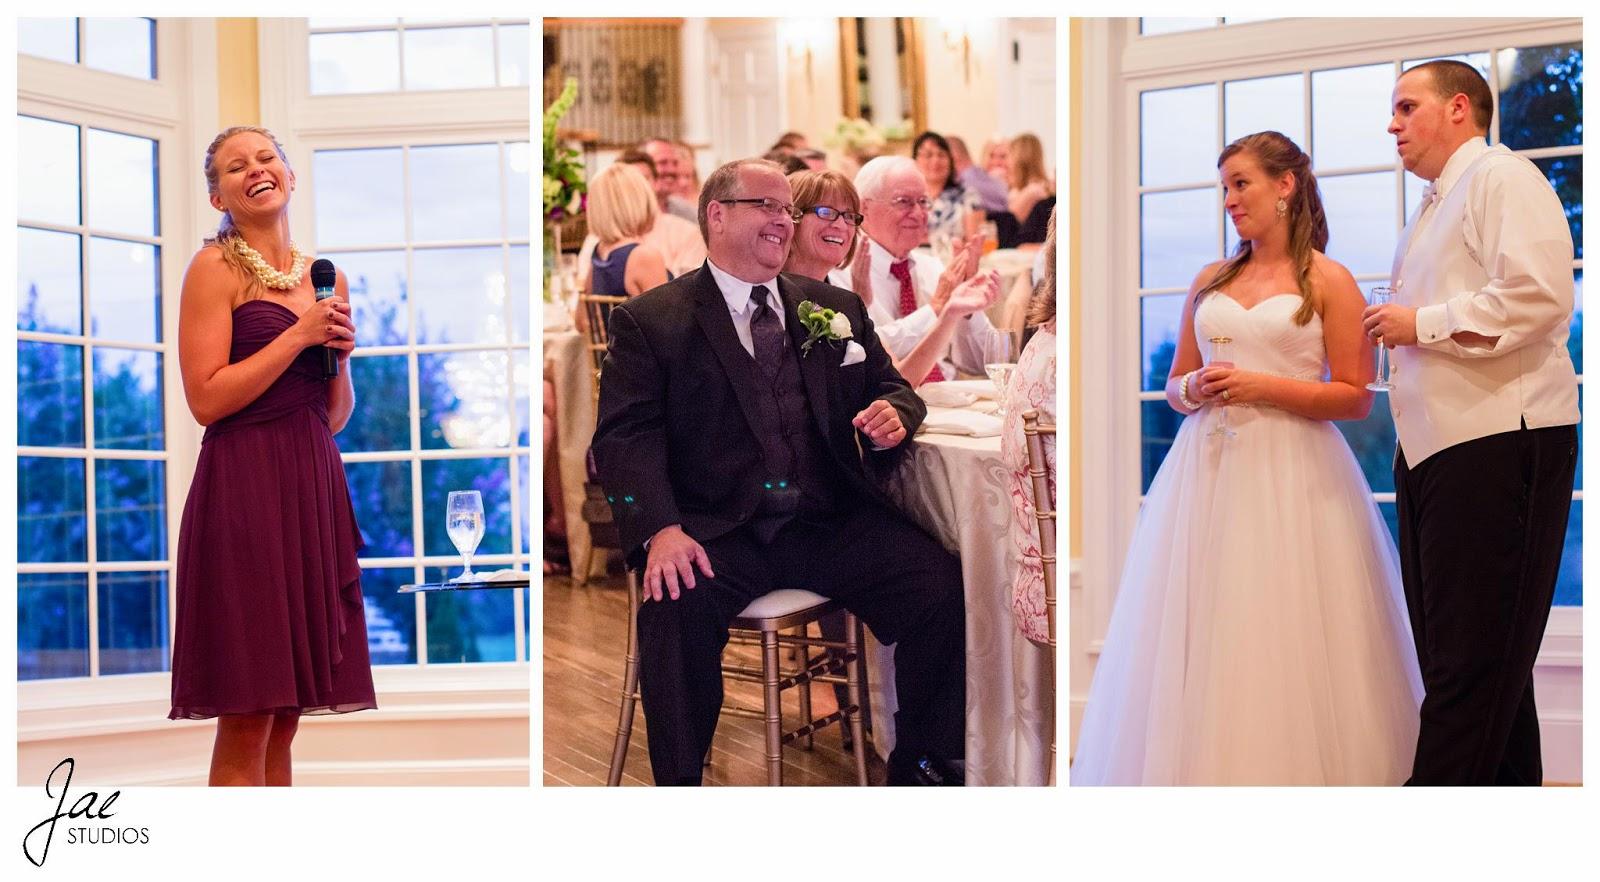 Jonathan and Julie, Bird cage, West Manor Estate, Wedding, Lynchburg, Virginia, Jae Studios, purple, wedding dress, tuxedo, father mother, bride, groom, maid of honor, speech, pearl, drink, window, laughing, funny